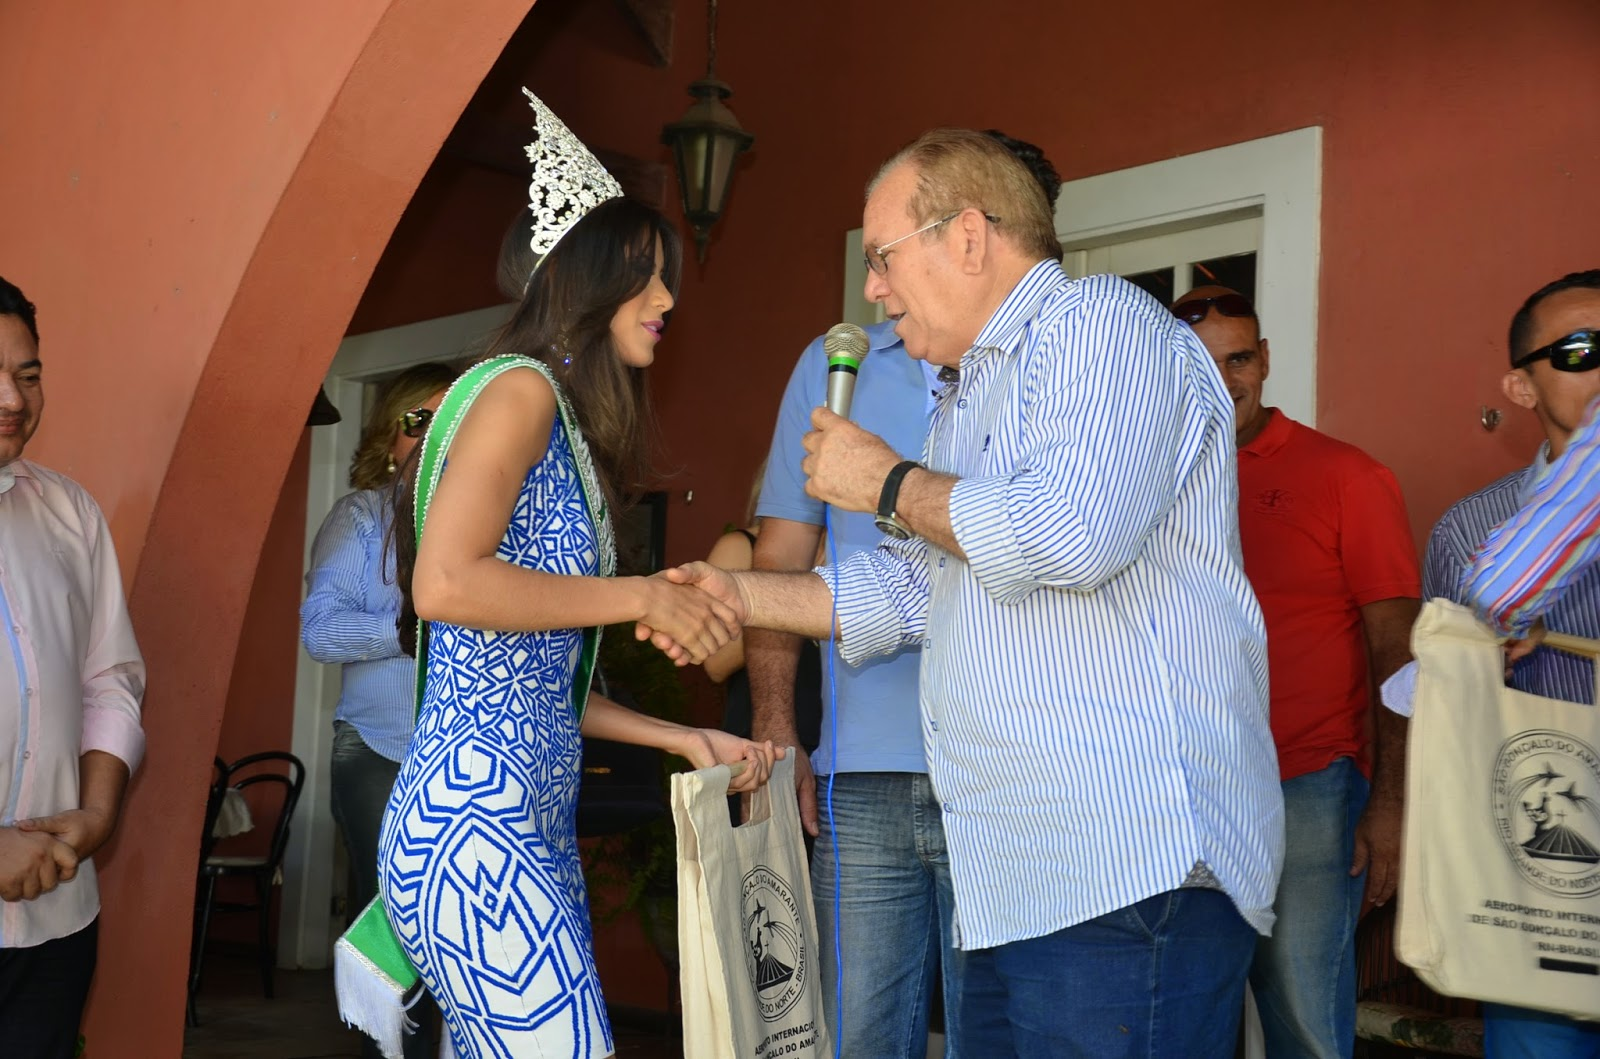 deise benicio, miss supranational distrito federal 2020/top 12 de miss international 2014. - Página 3 6gr4c9wu